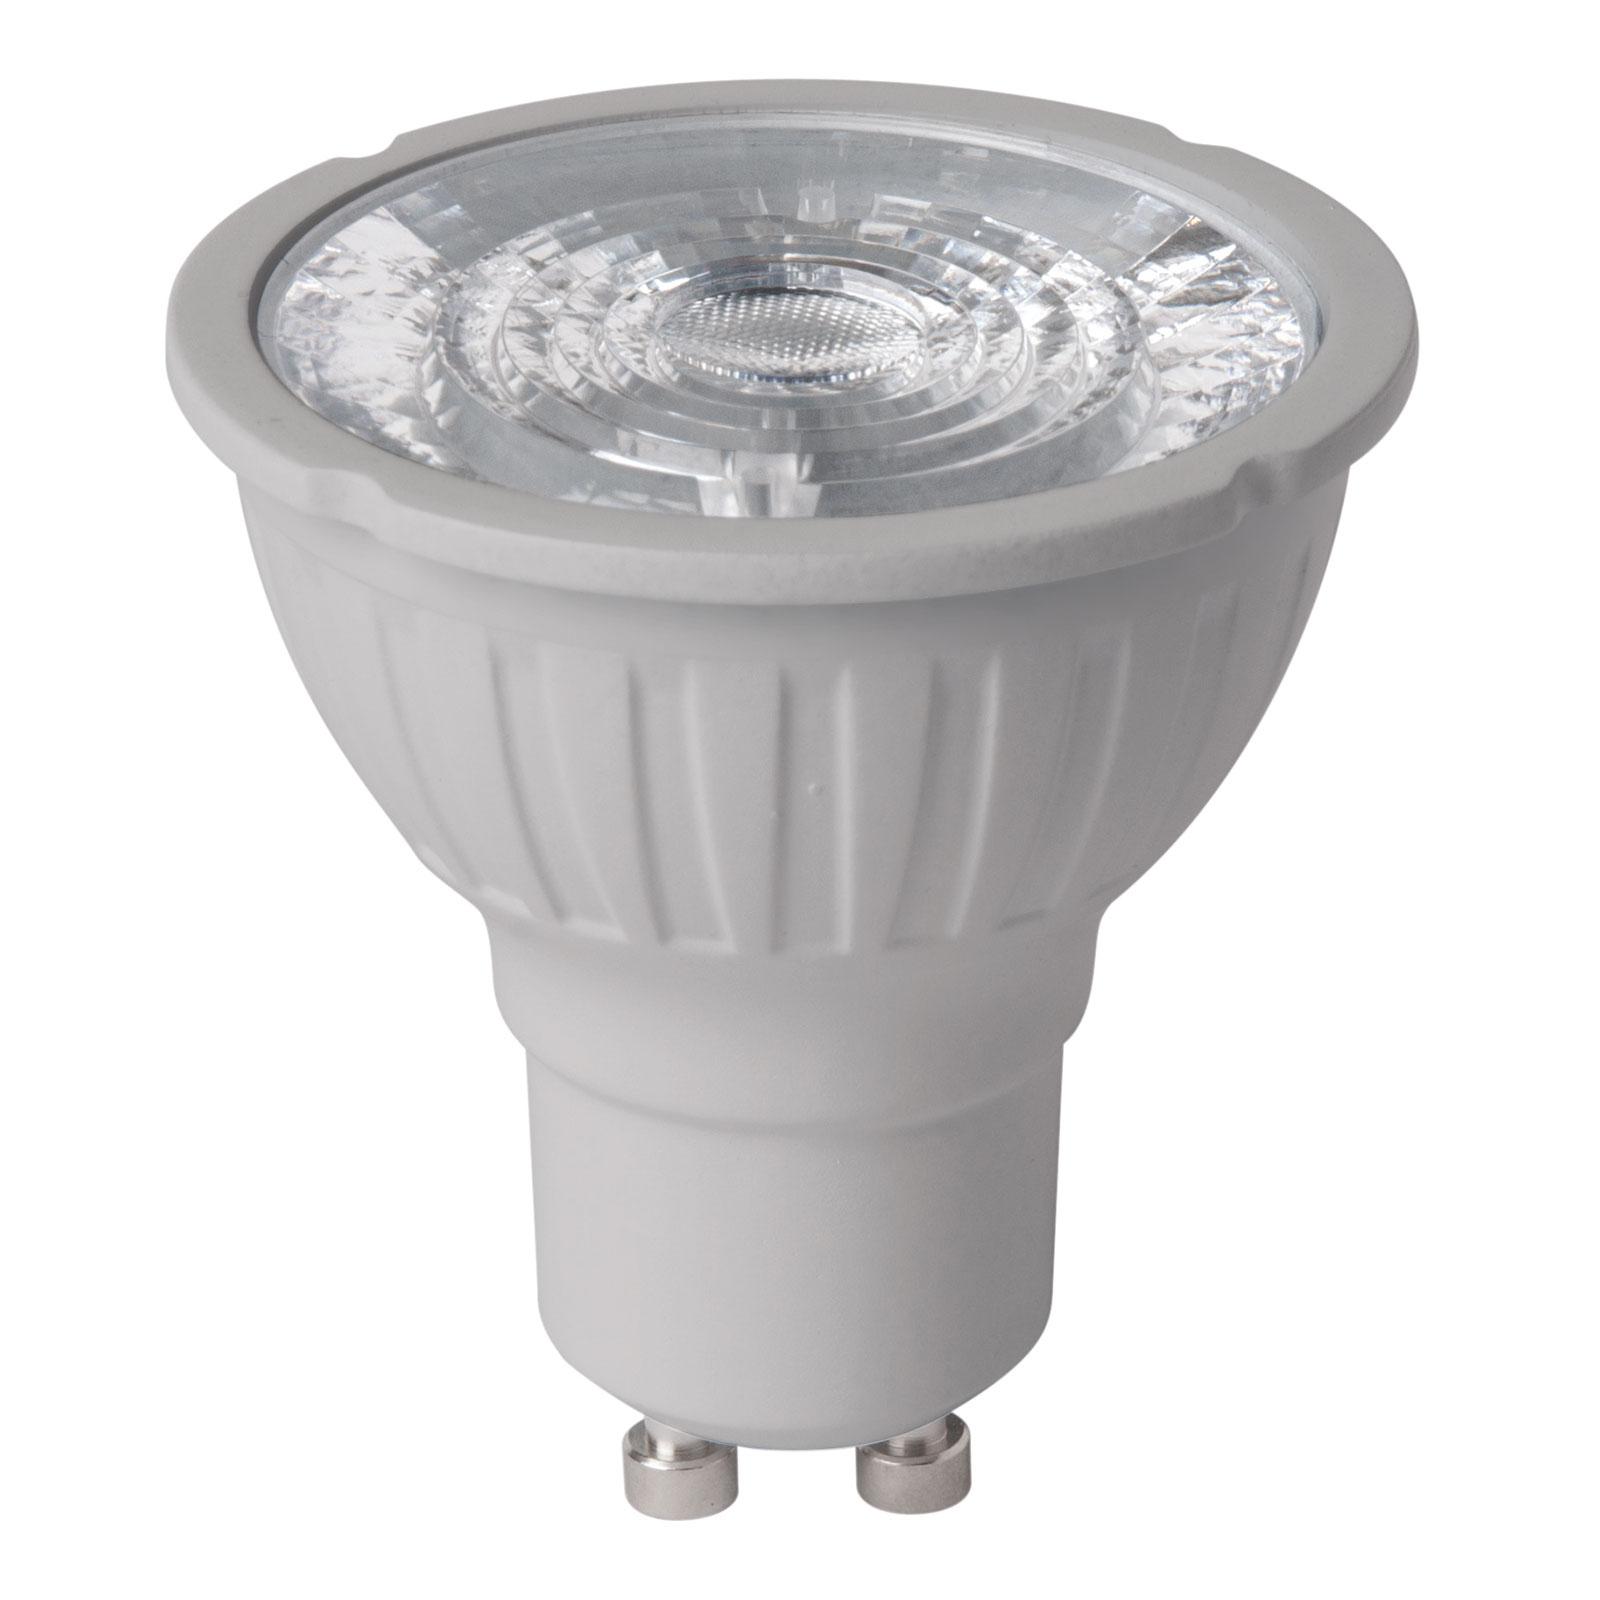 LED-reflektor GU10 dual beam 5,2W dimbar 2 800 K